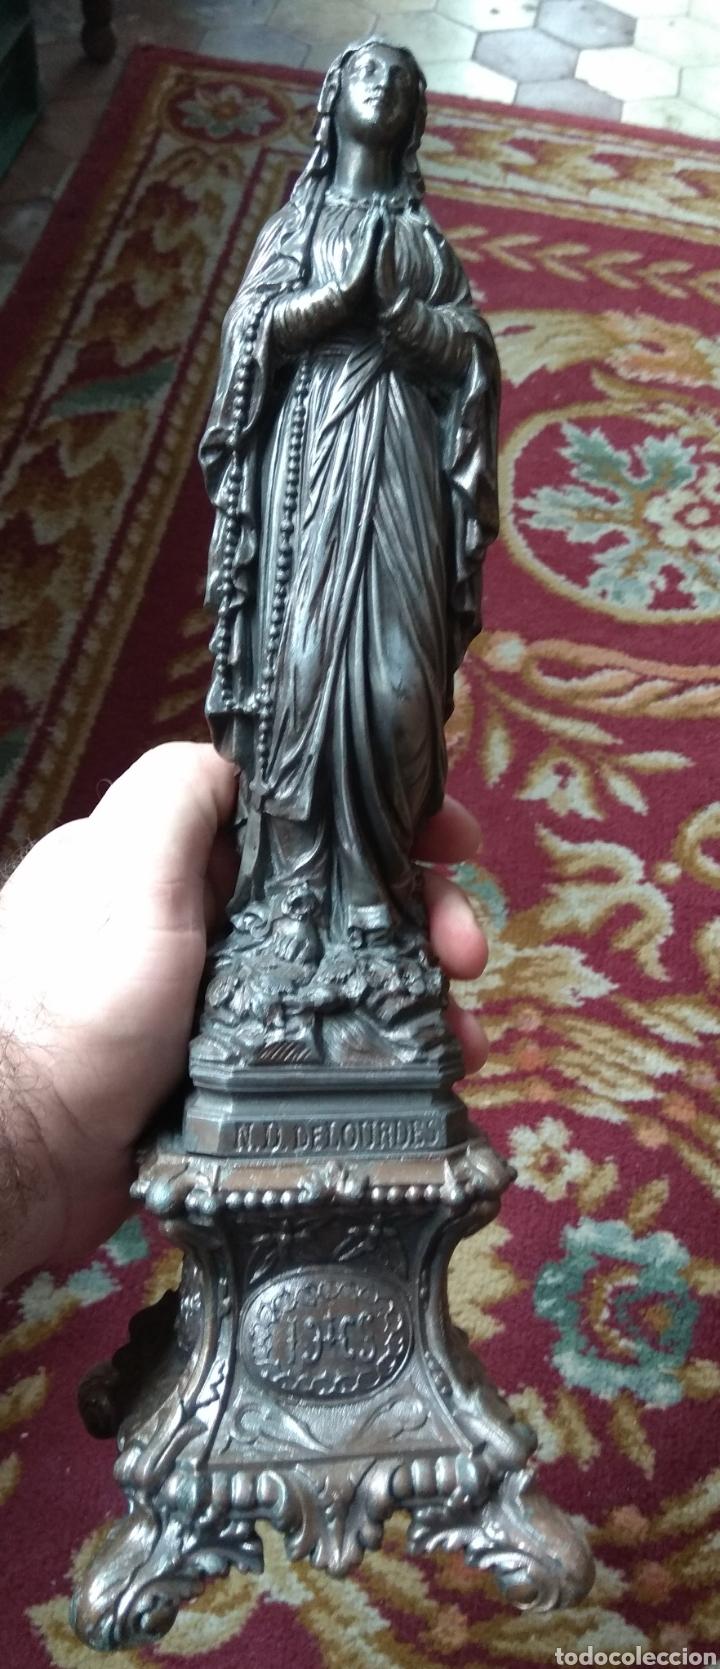 Arte: Escultura Virgen de Lourdes Calamina - Foto 15 - 134712946